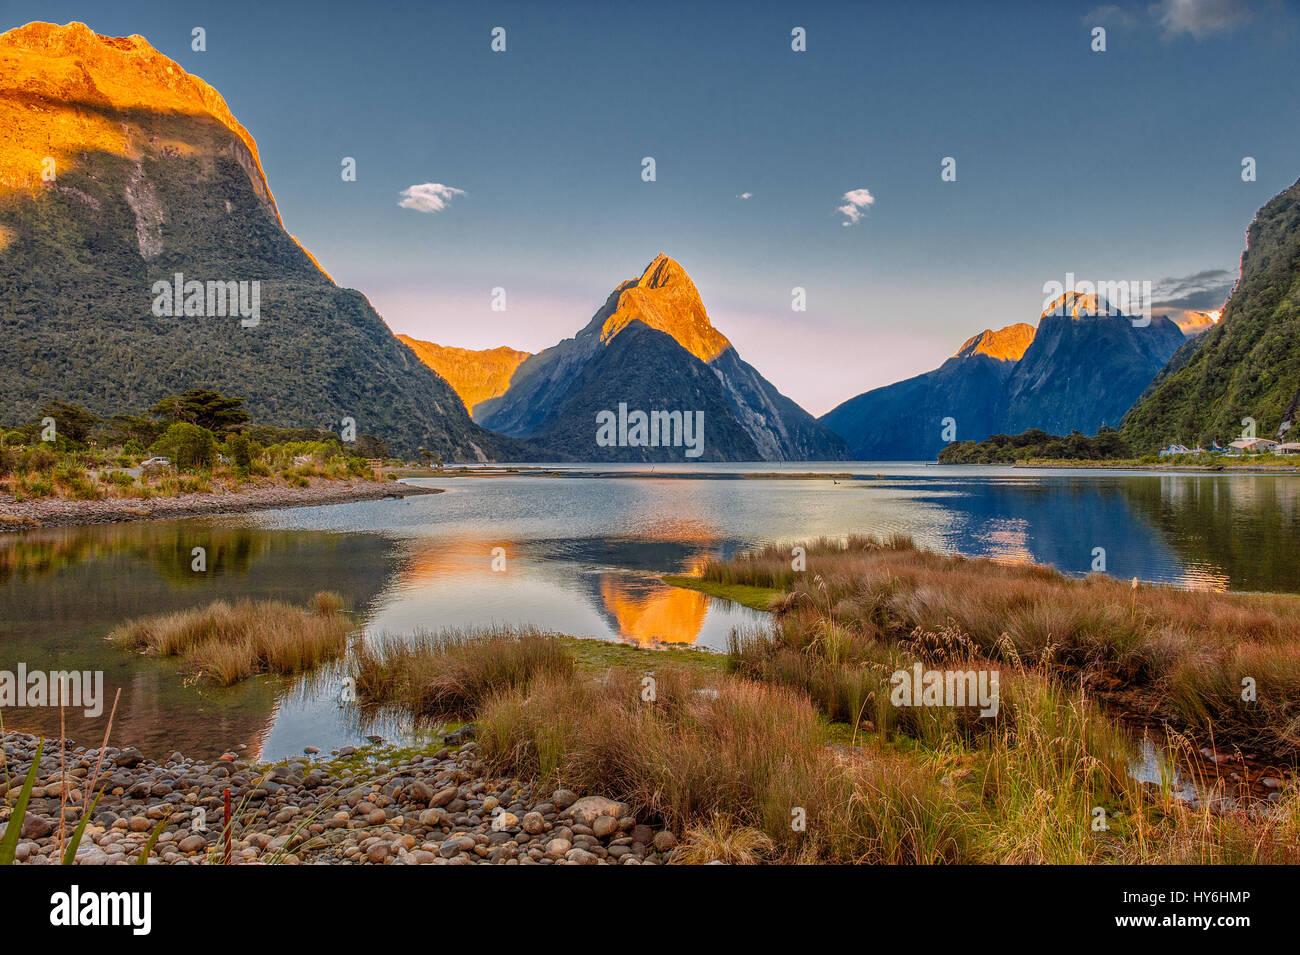 L'aube à Milford Sound, Fiordlands National Park, New Zealand Photo Stock